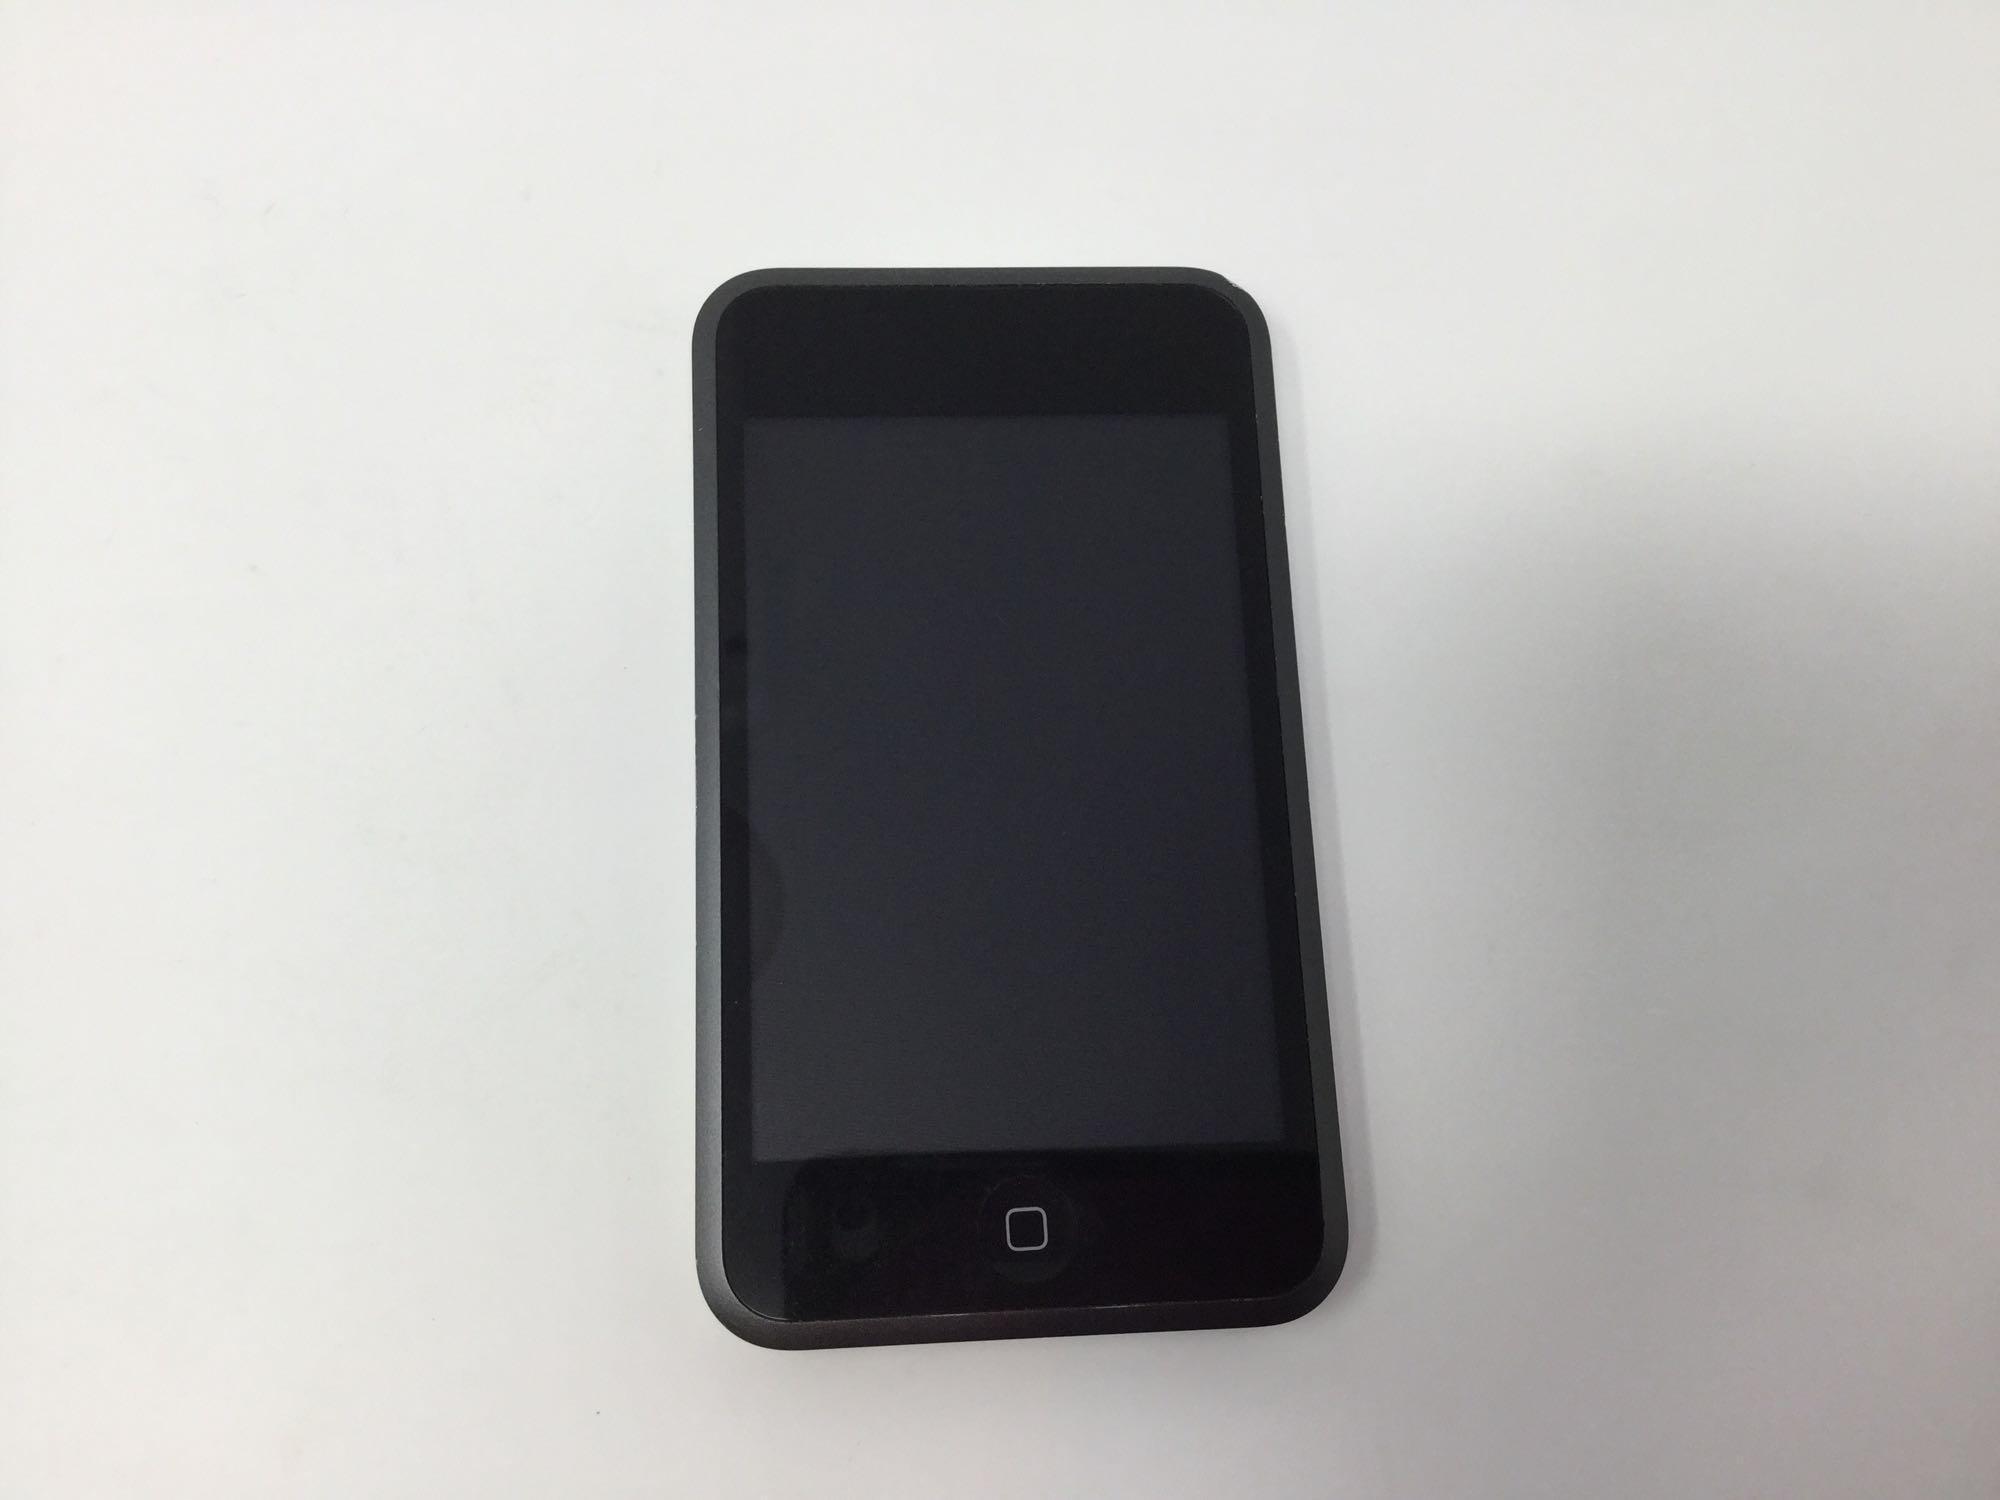 Lot 5 - iPod Touch Black 16GB